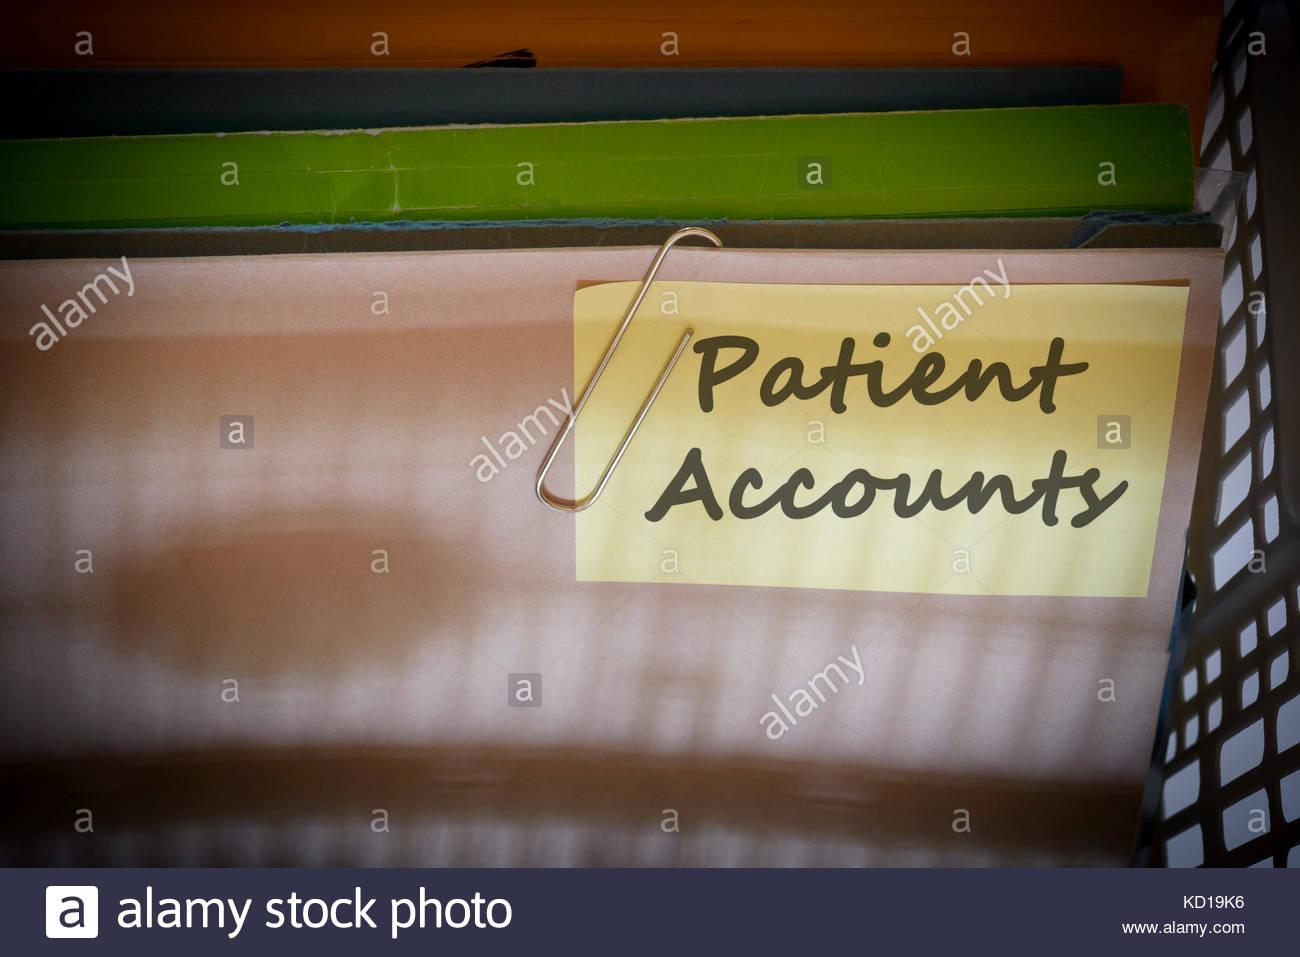 Patient Accounts written on document folder, Dorset, England. - Stock Image